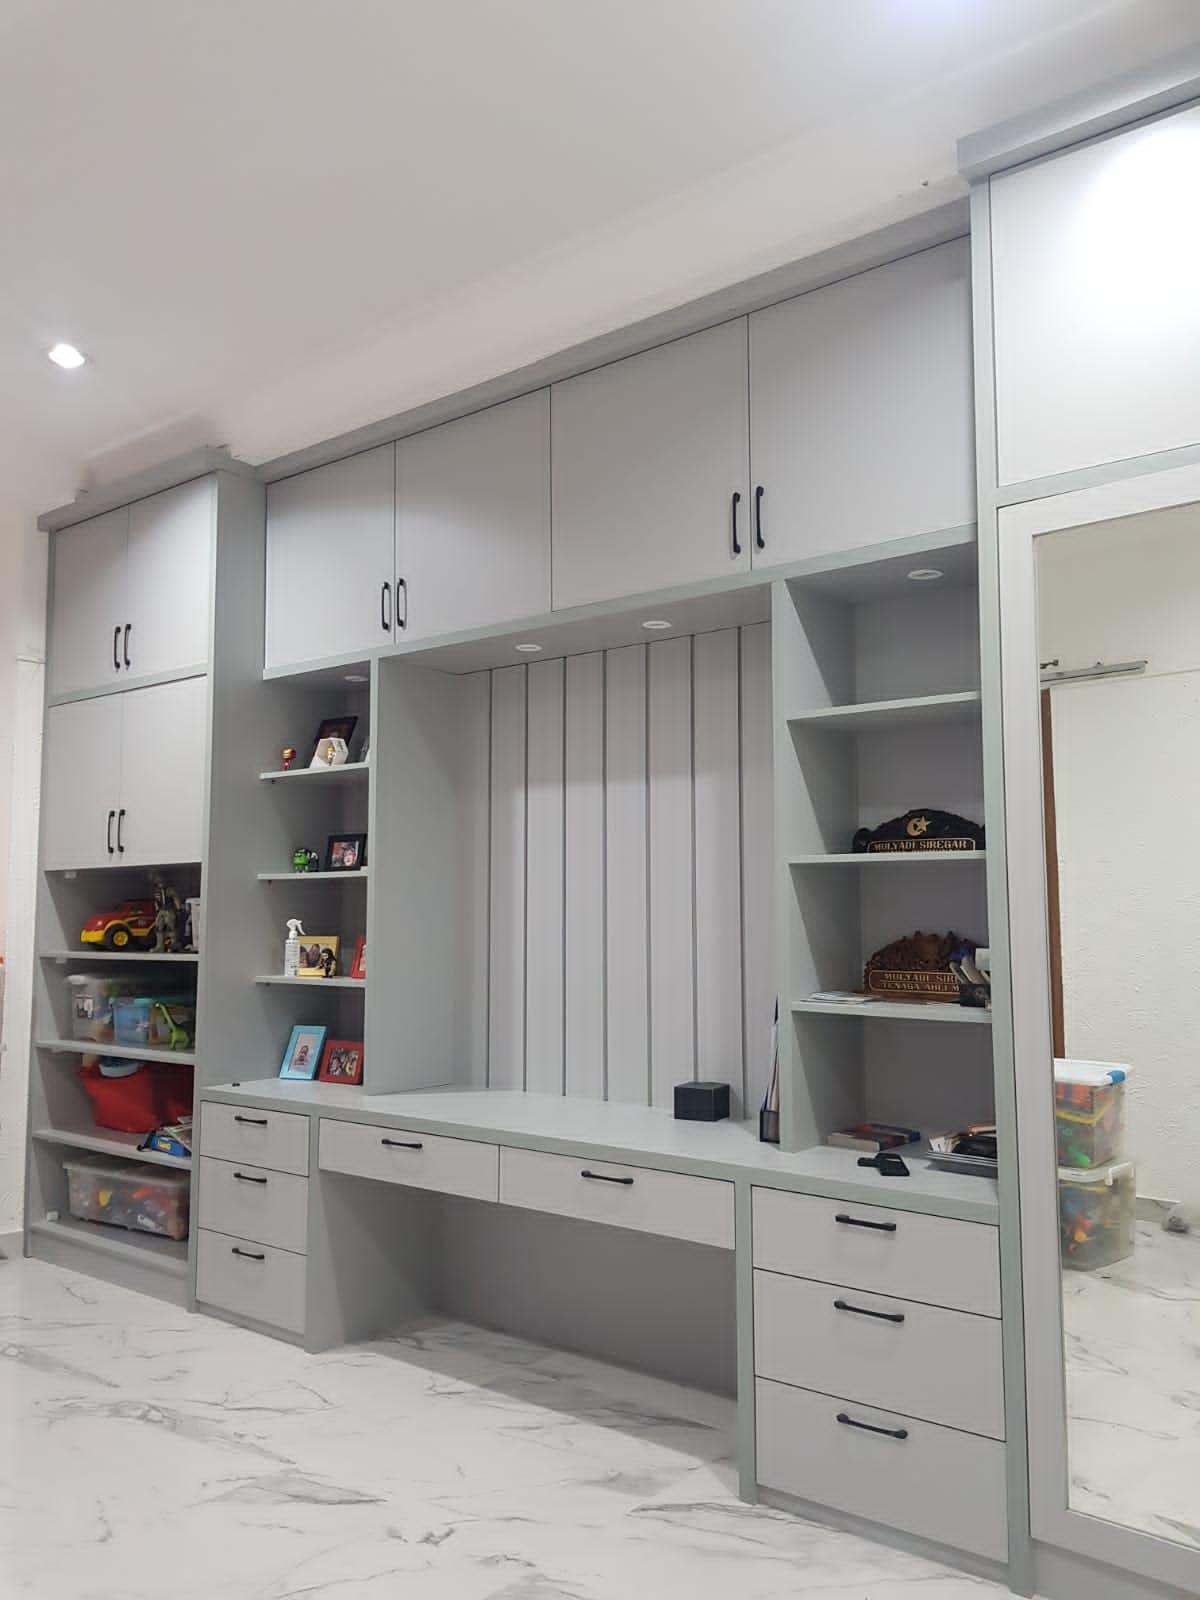 Project Belia Kitchen Set - Lemari Serbaguna - Pondok Indah - Ibu Tyaimage00002